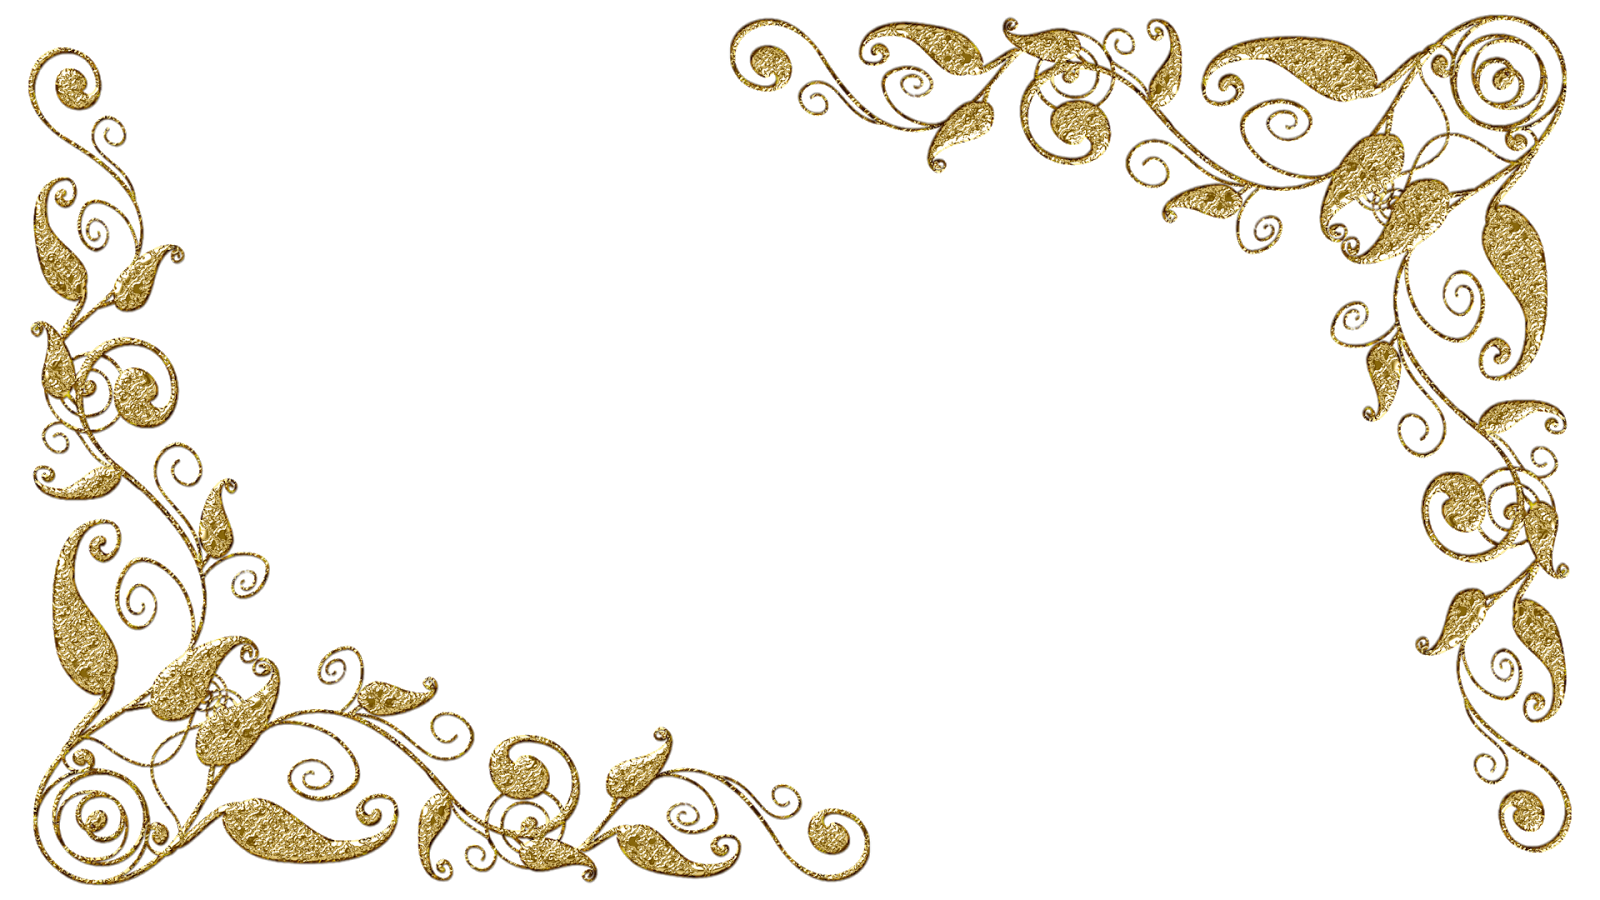 Molduras Arabescos 11 Molduras Douradas Molduras Molduras